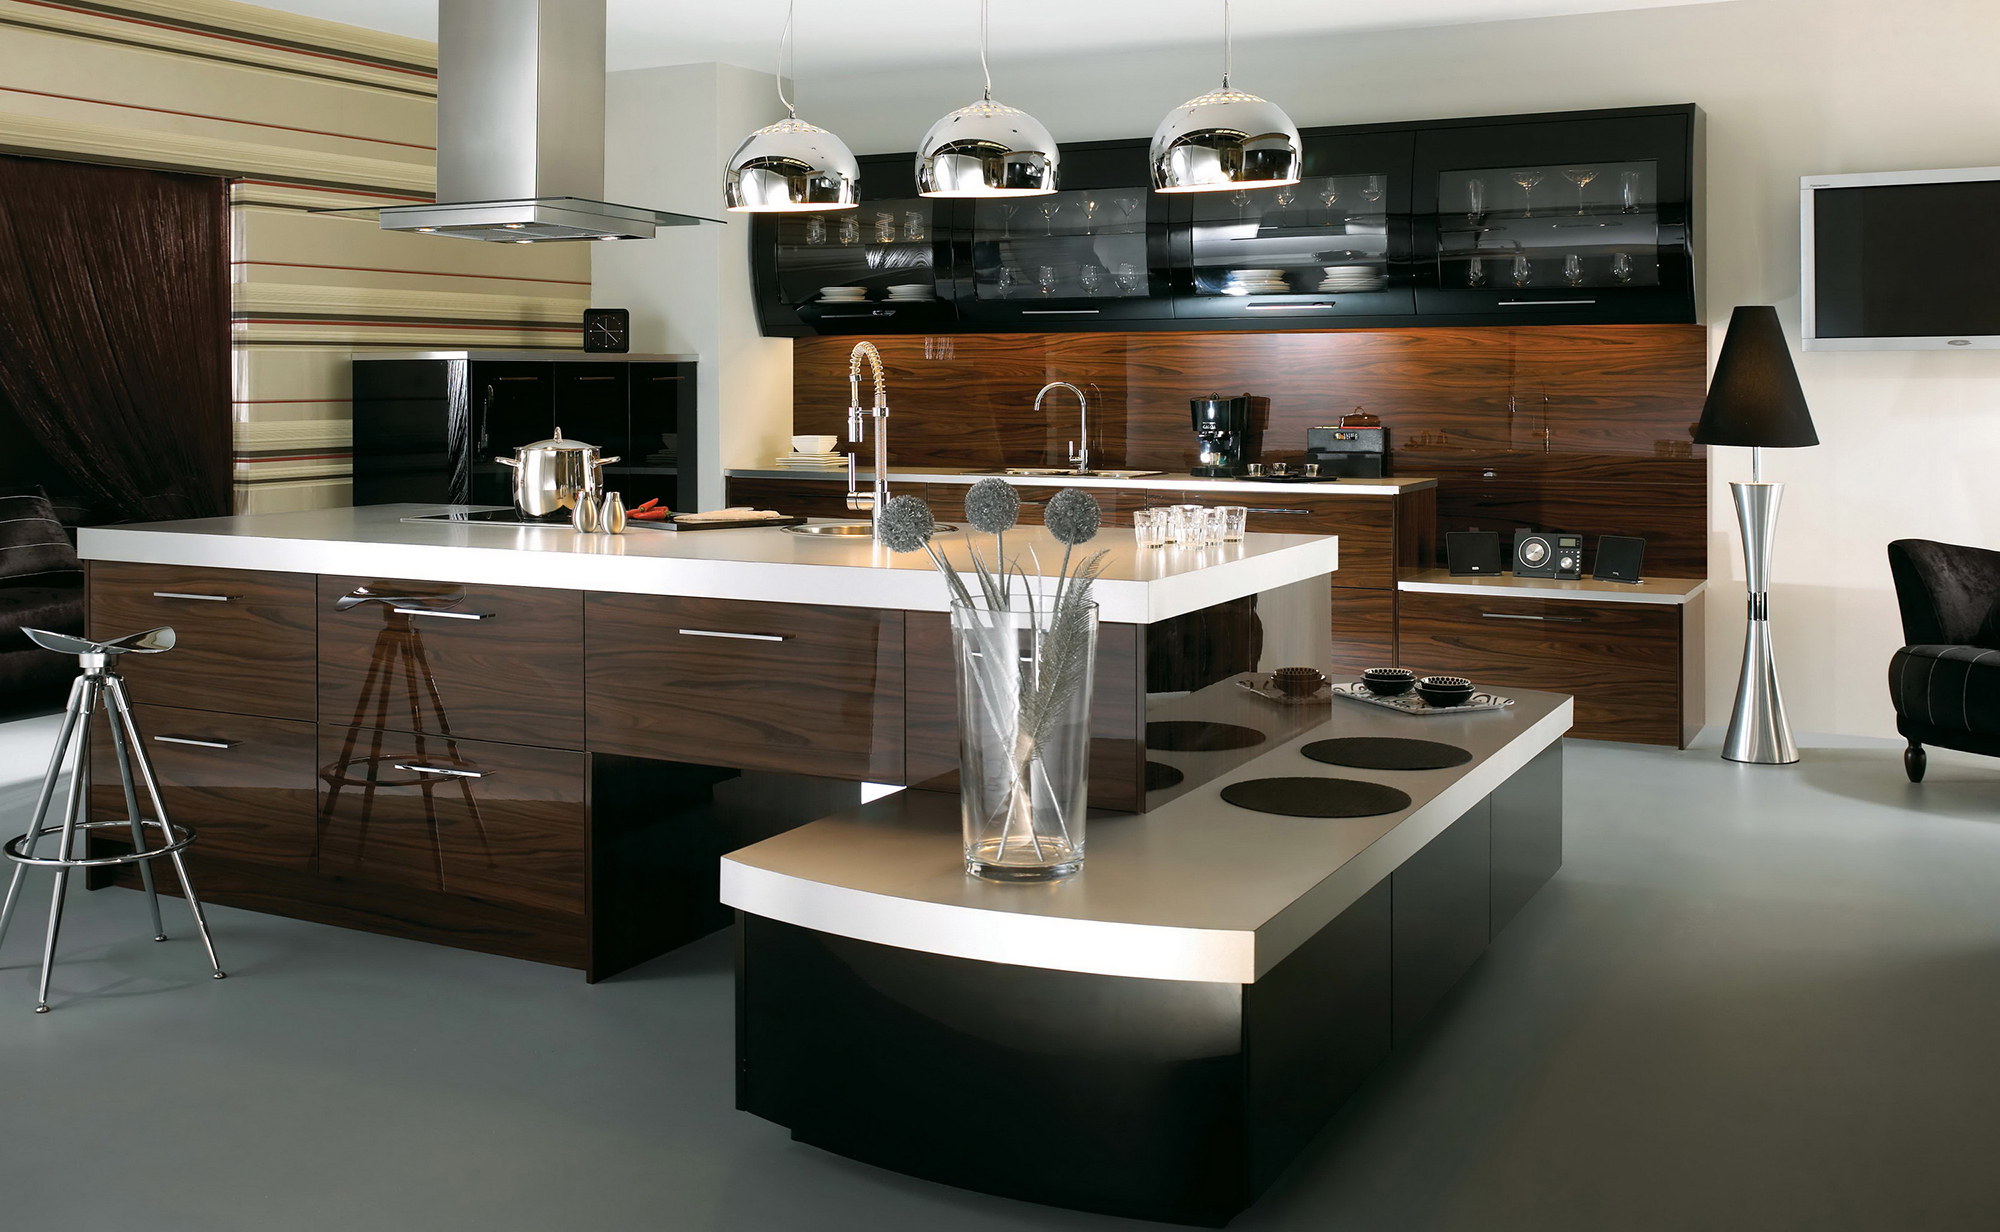 Металлические лампы на кухне в стиле хай-тек